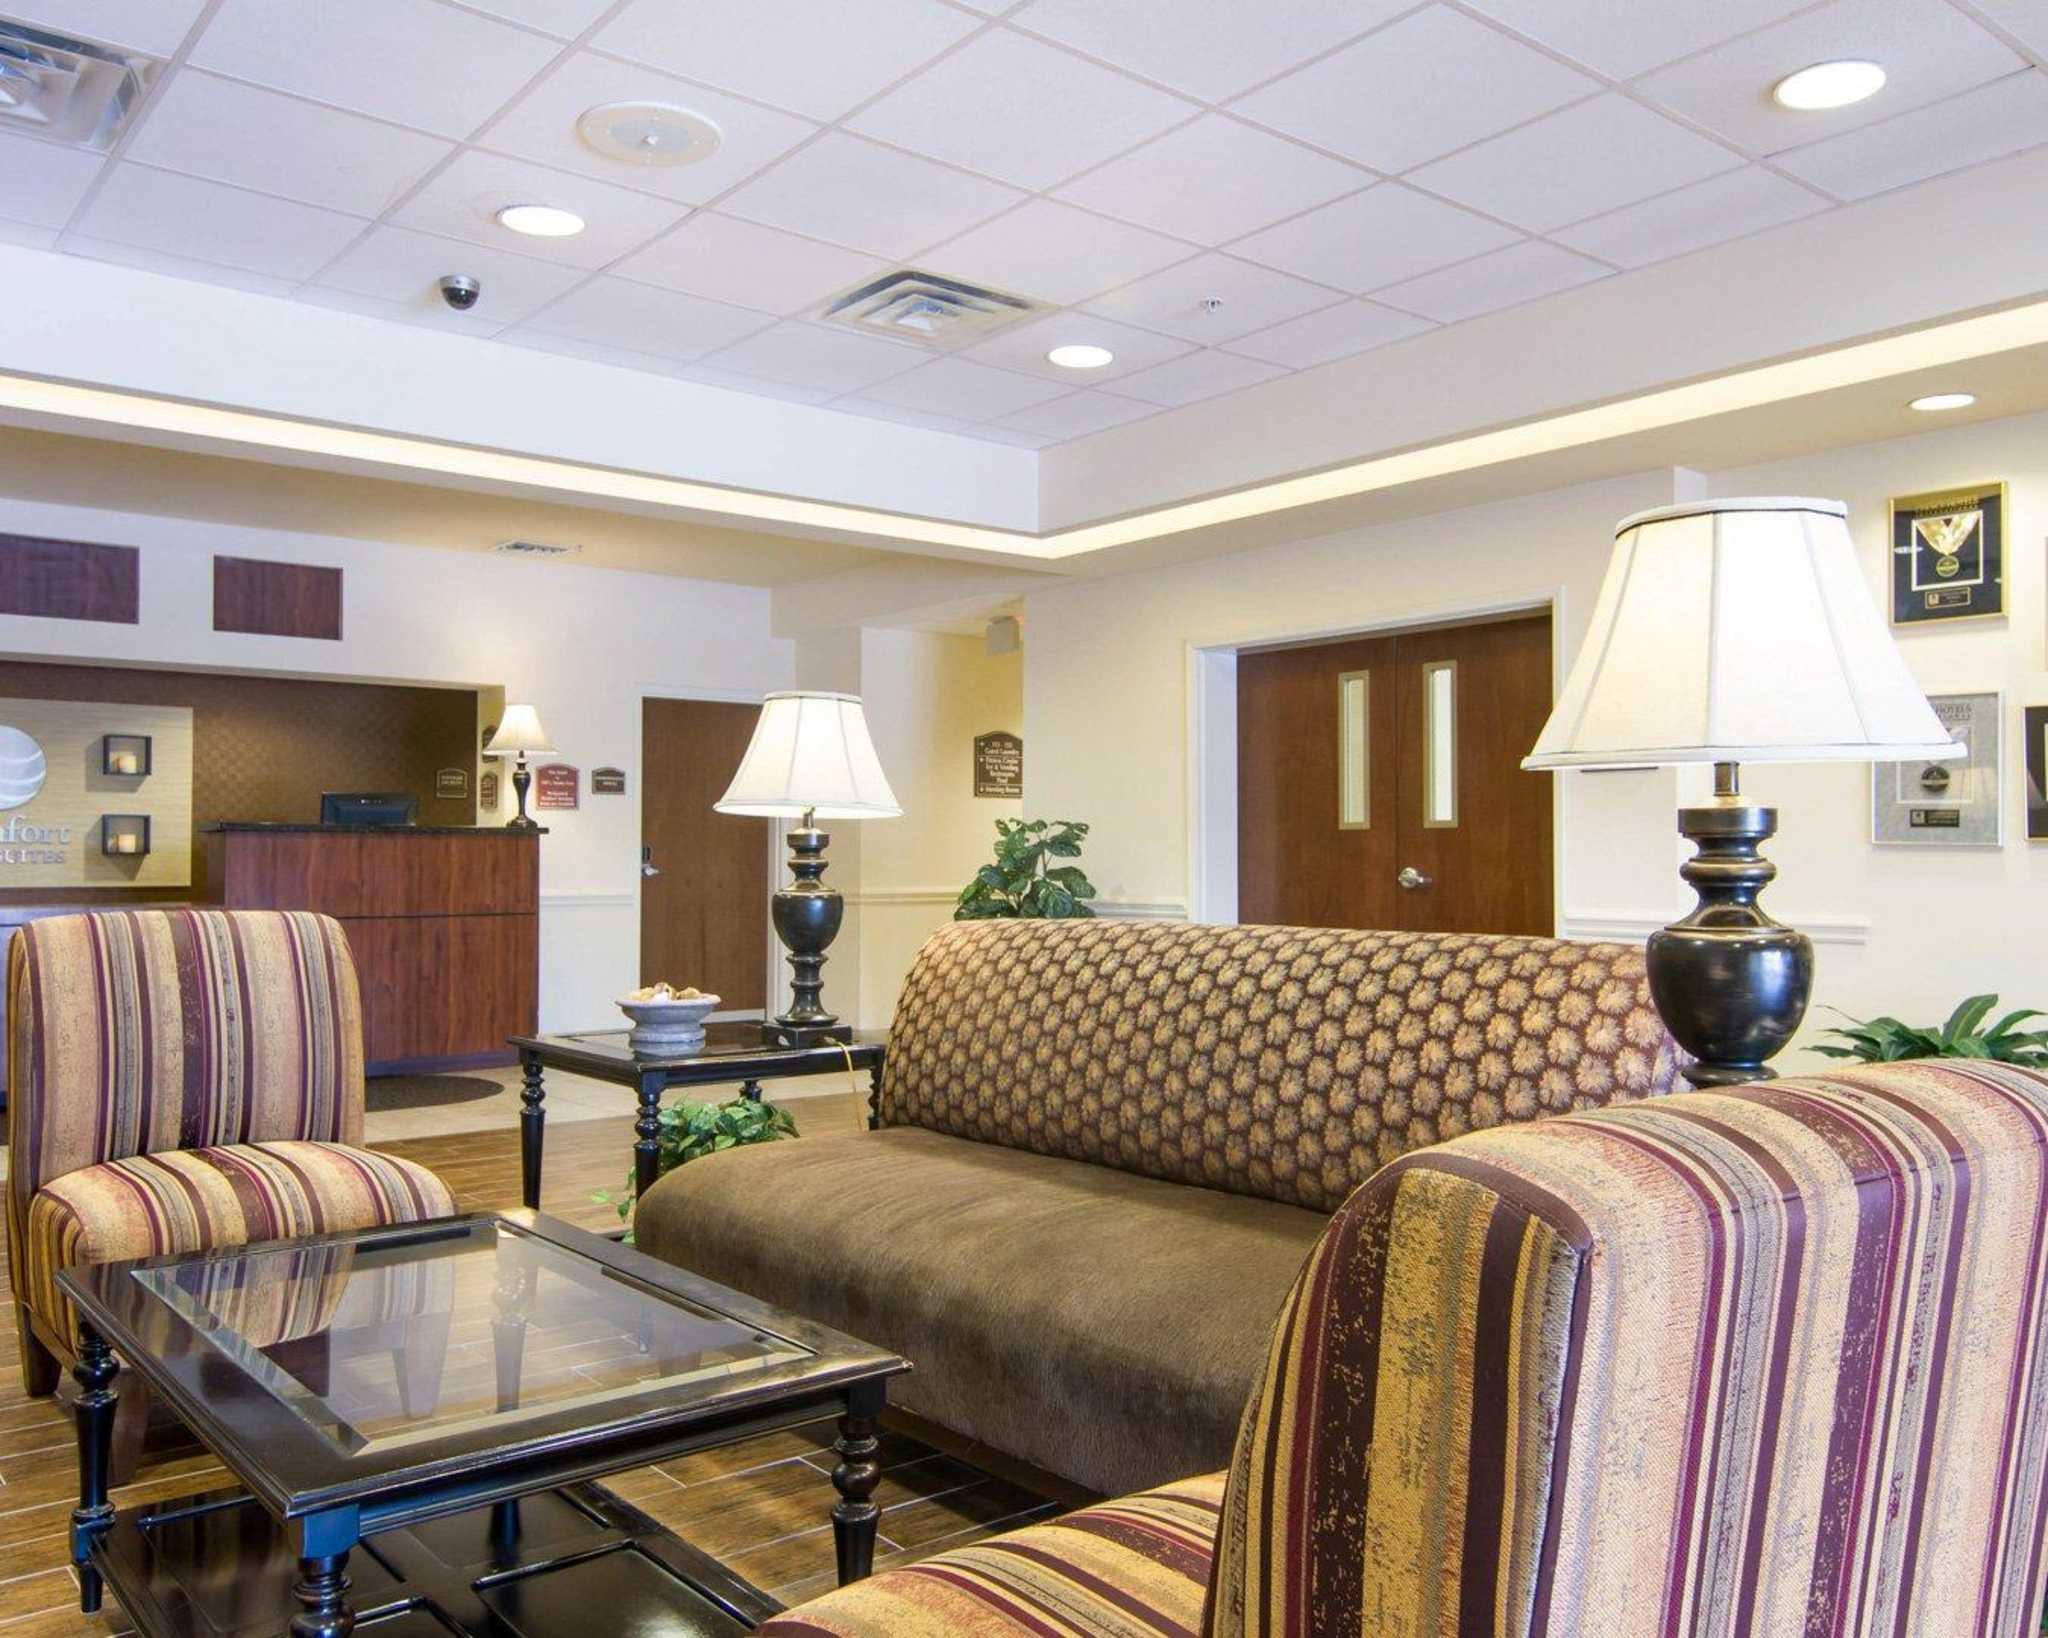 Comfort Inn & Suites Airport image 13